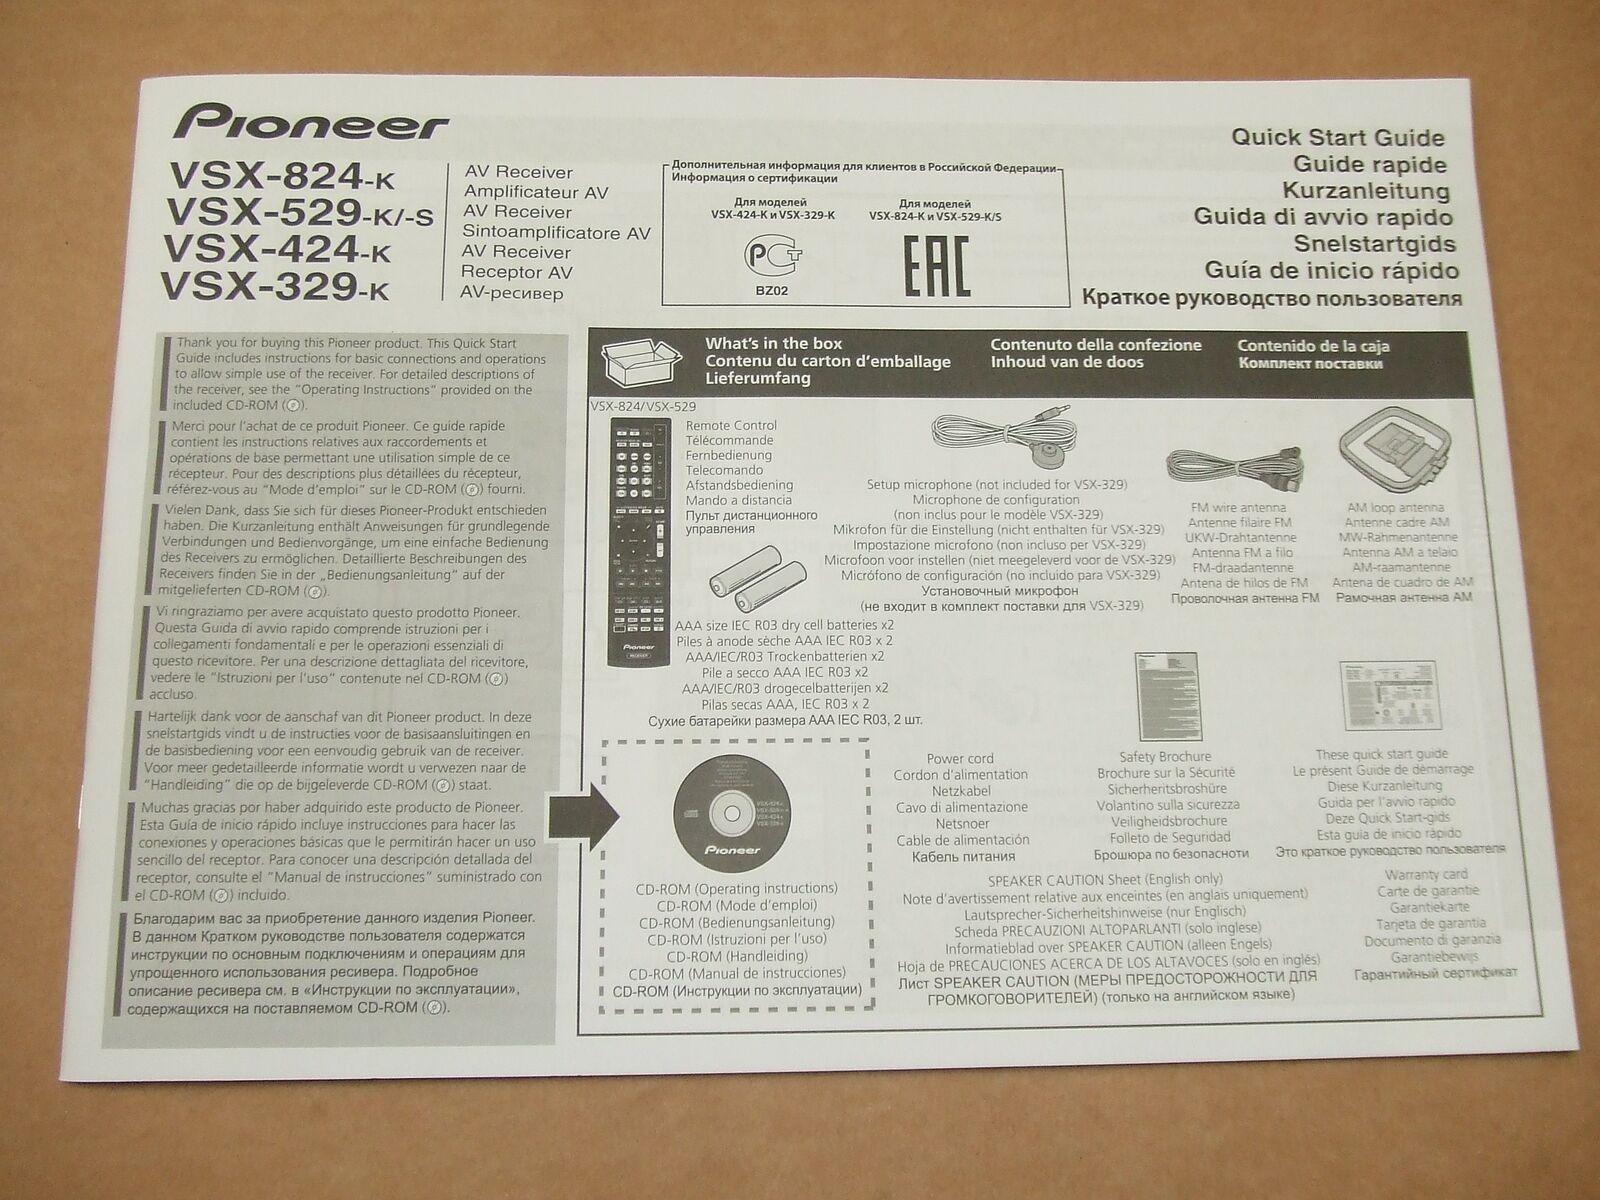 pioneer vsx-824-k user manual